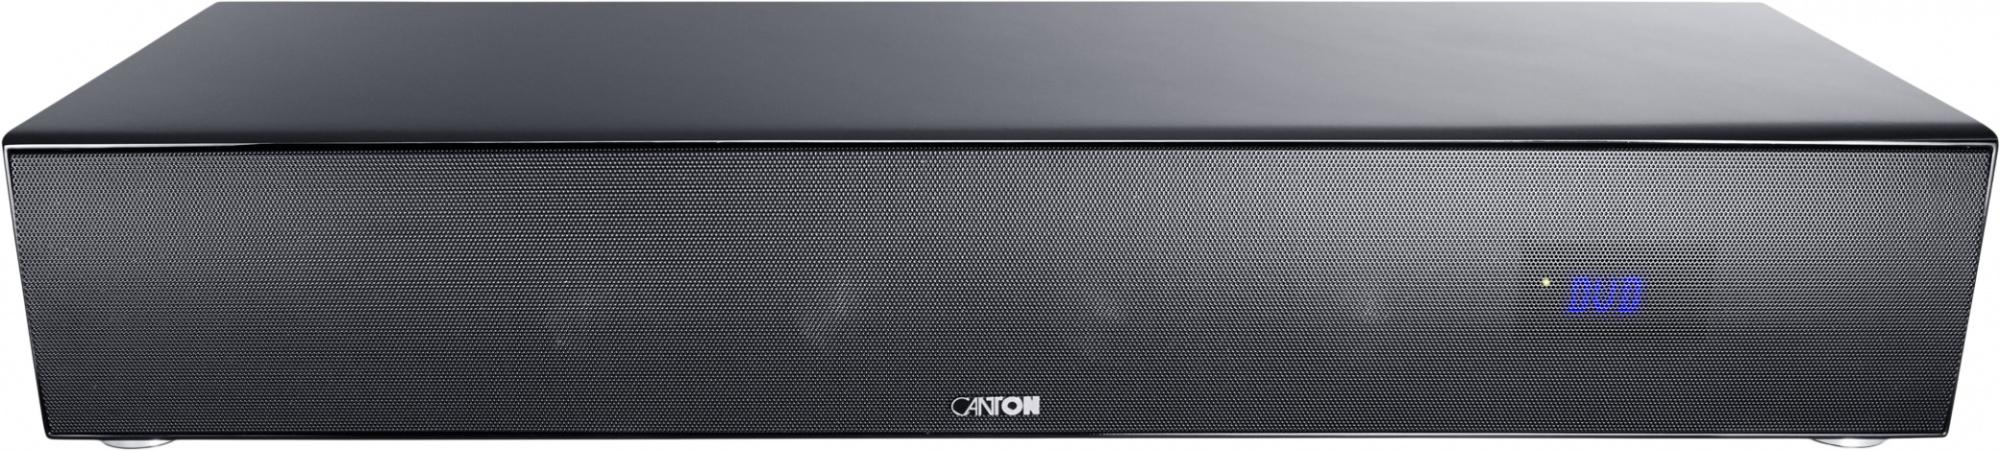 Подробнее о Canton DM 90.3 - саундбар (Black) lg sh3b саундбар